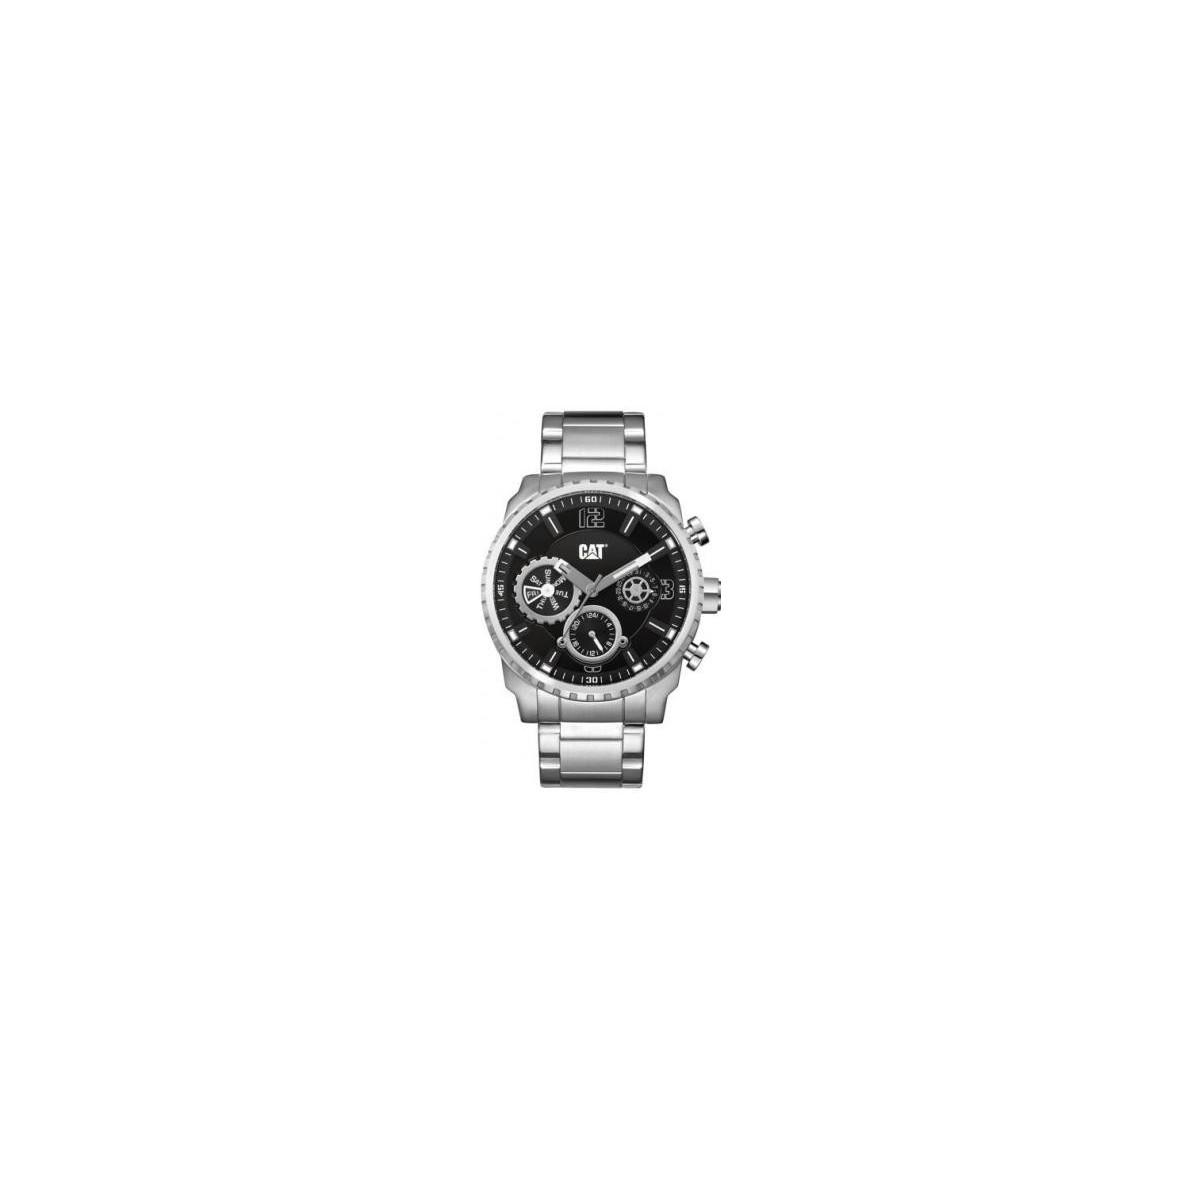 https://www.gaberjoyeria.com/3408-thickbox_default/reloj-caterpillar-hombre.jpg